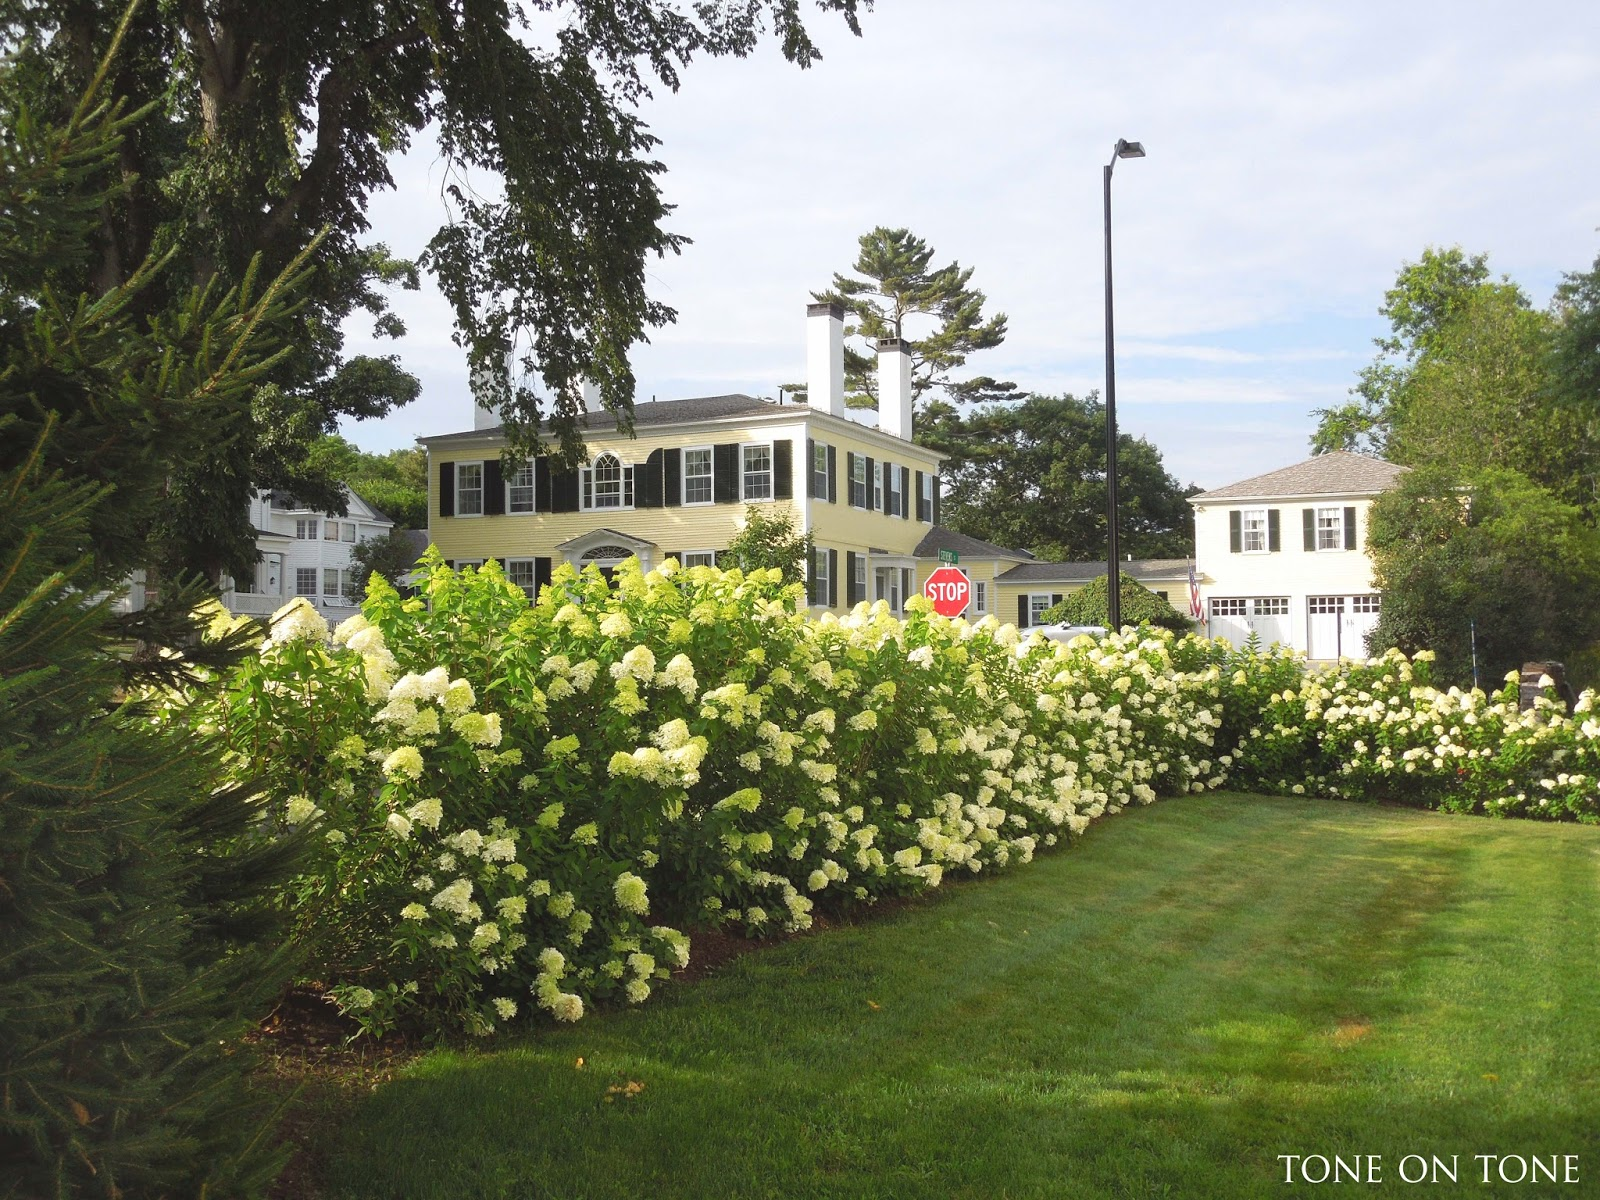 Tone On Tone Interior Garden Design In The Limelight